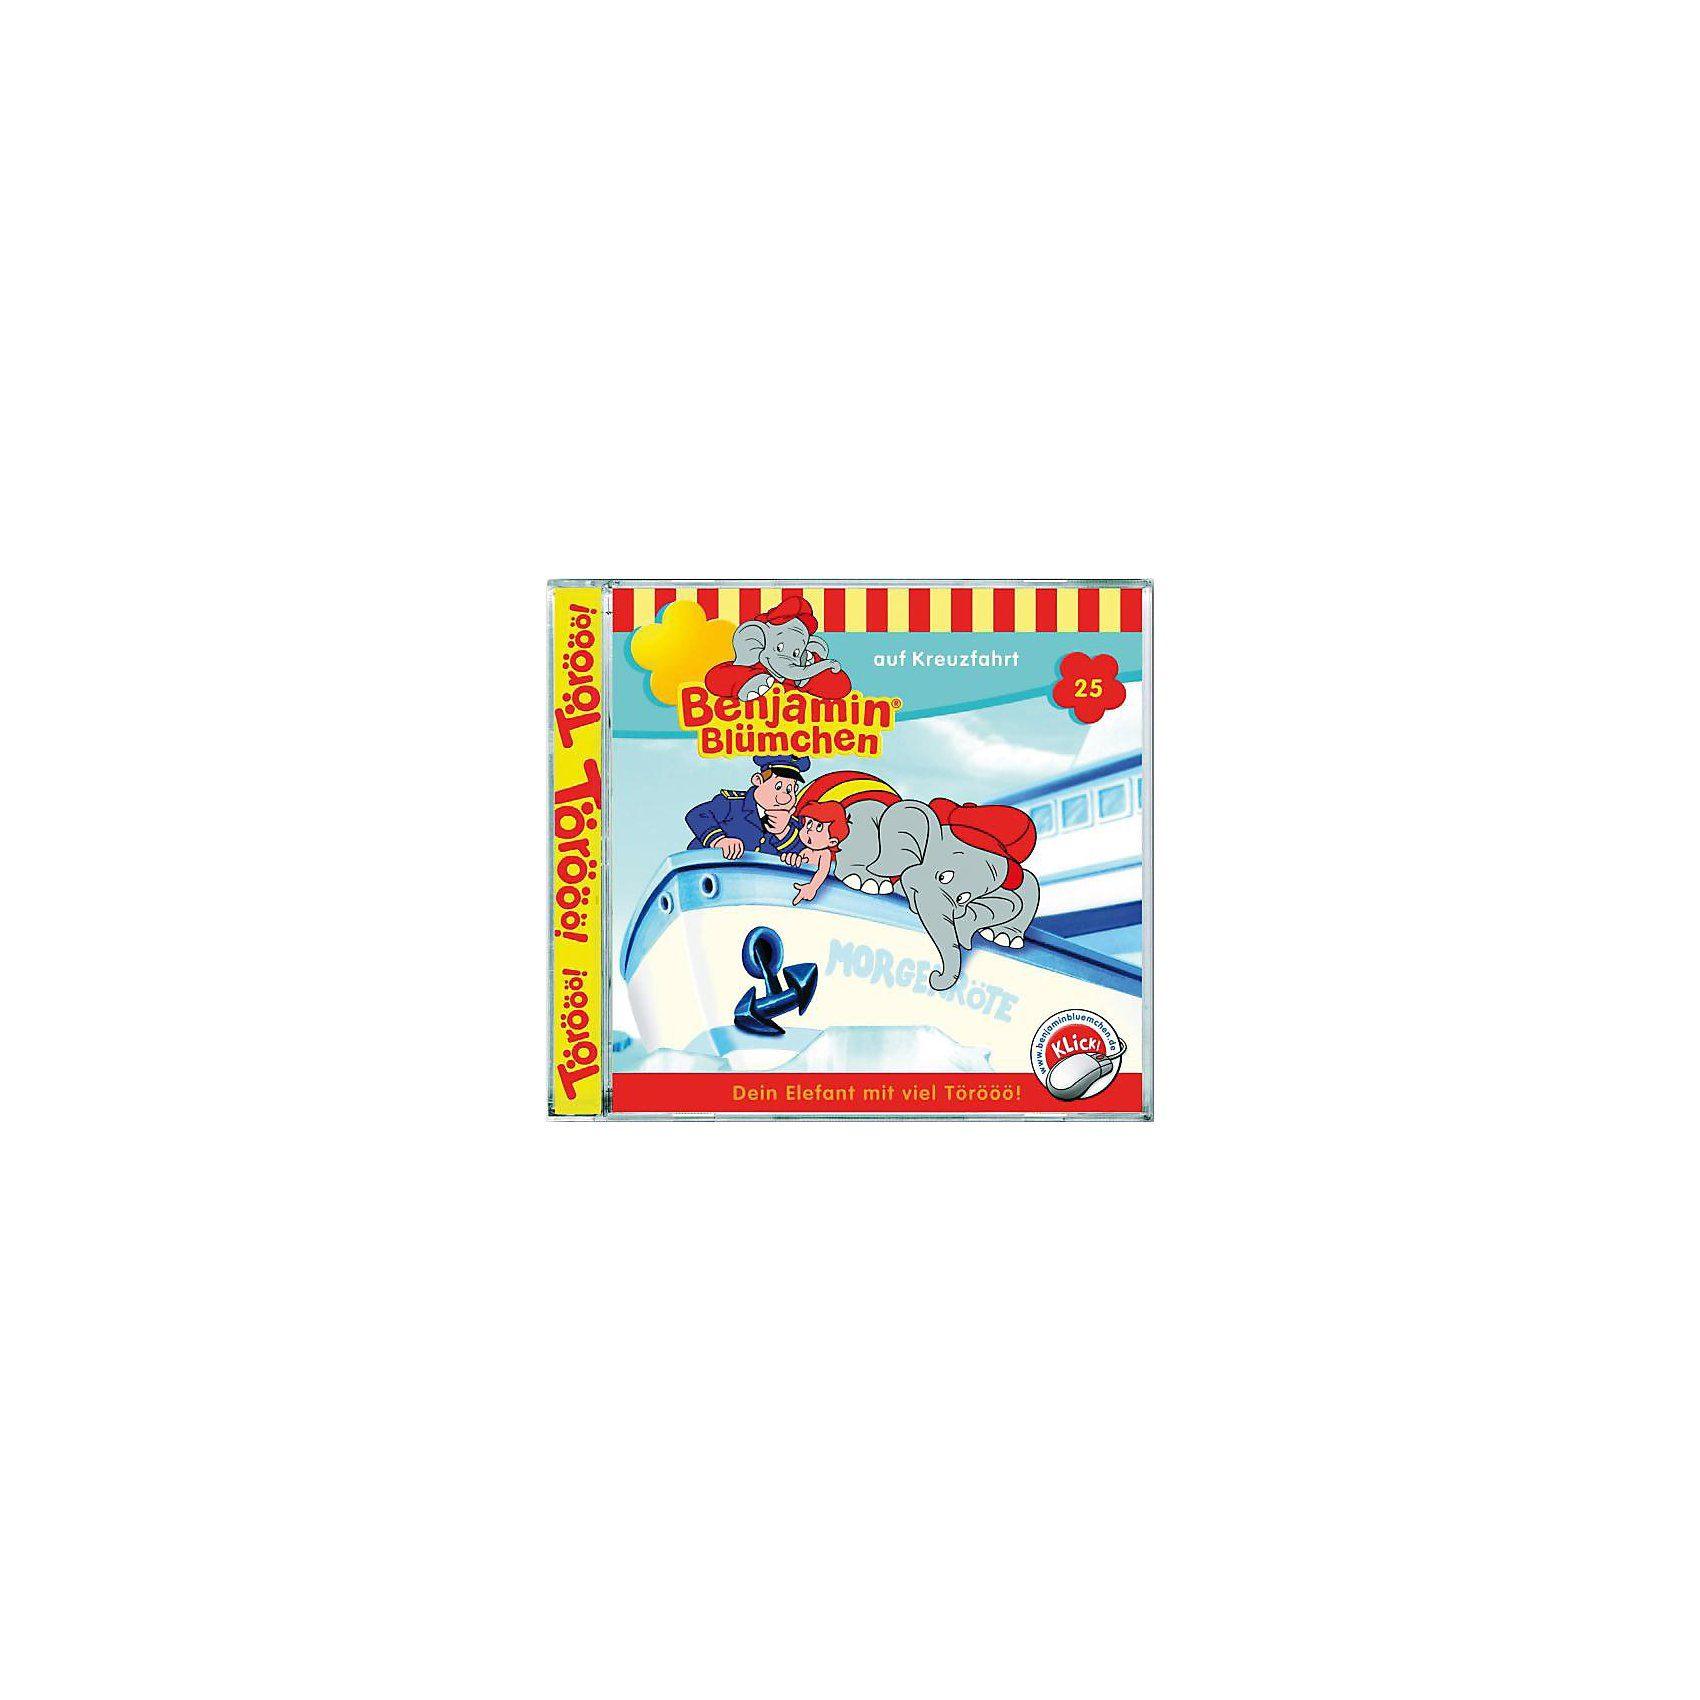 Kiddinx CD Benjamin Blümchen 25 - auf Kreuzfahrt